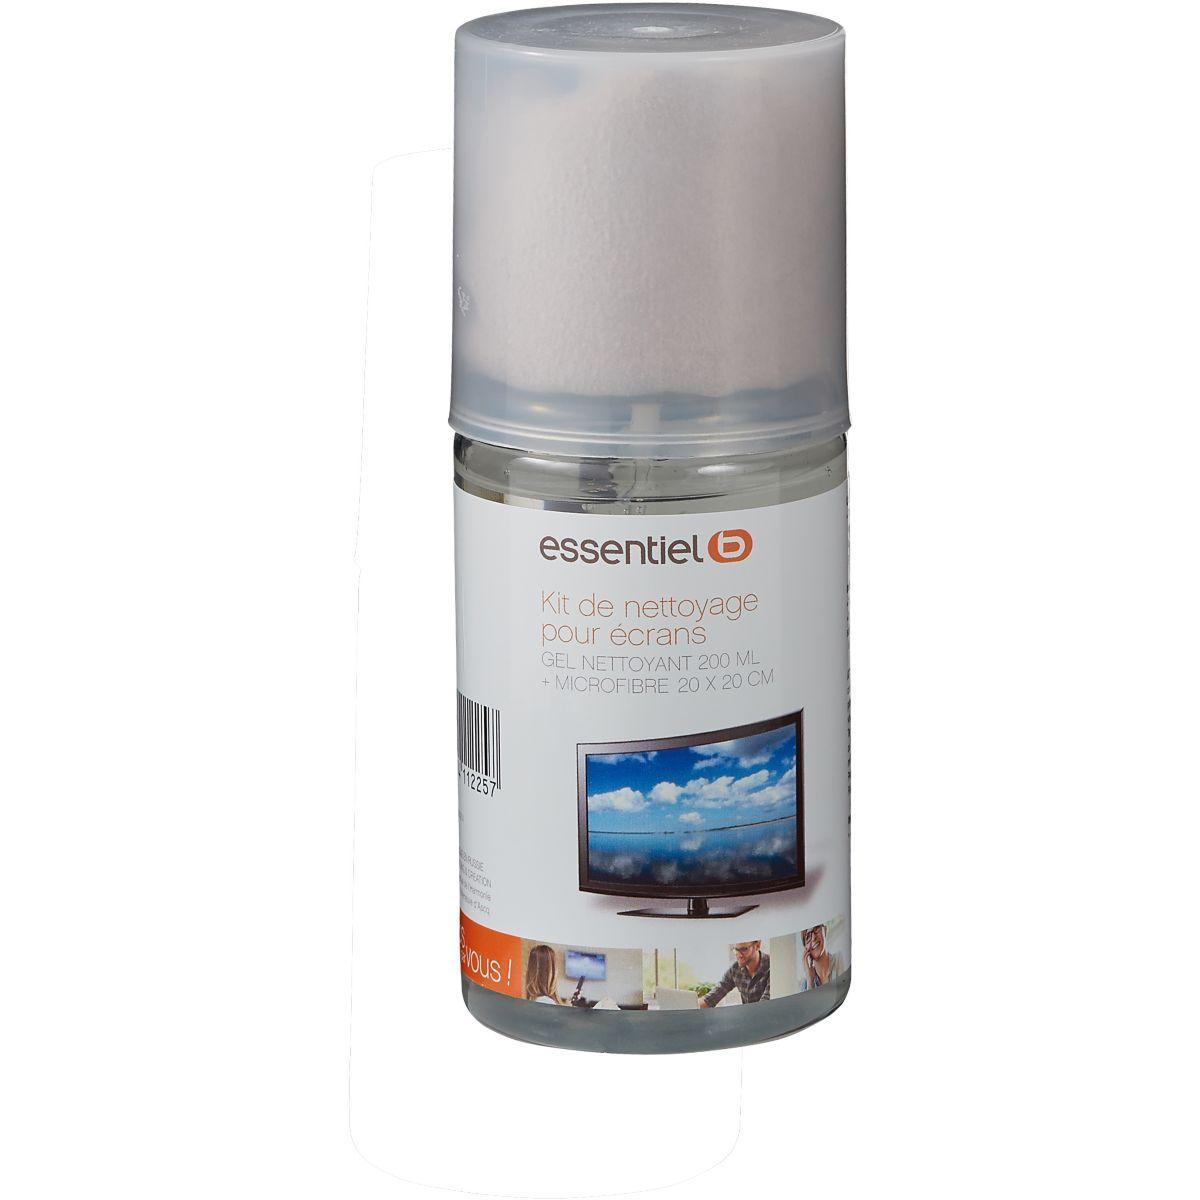 Kit de nettoyage essentielb gel 200ml+micro fibre 25x25cm (photo)